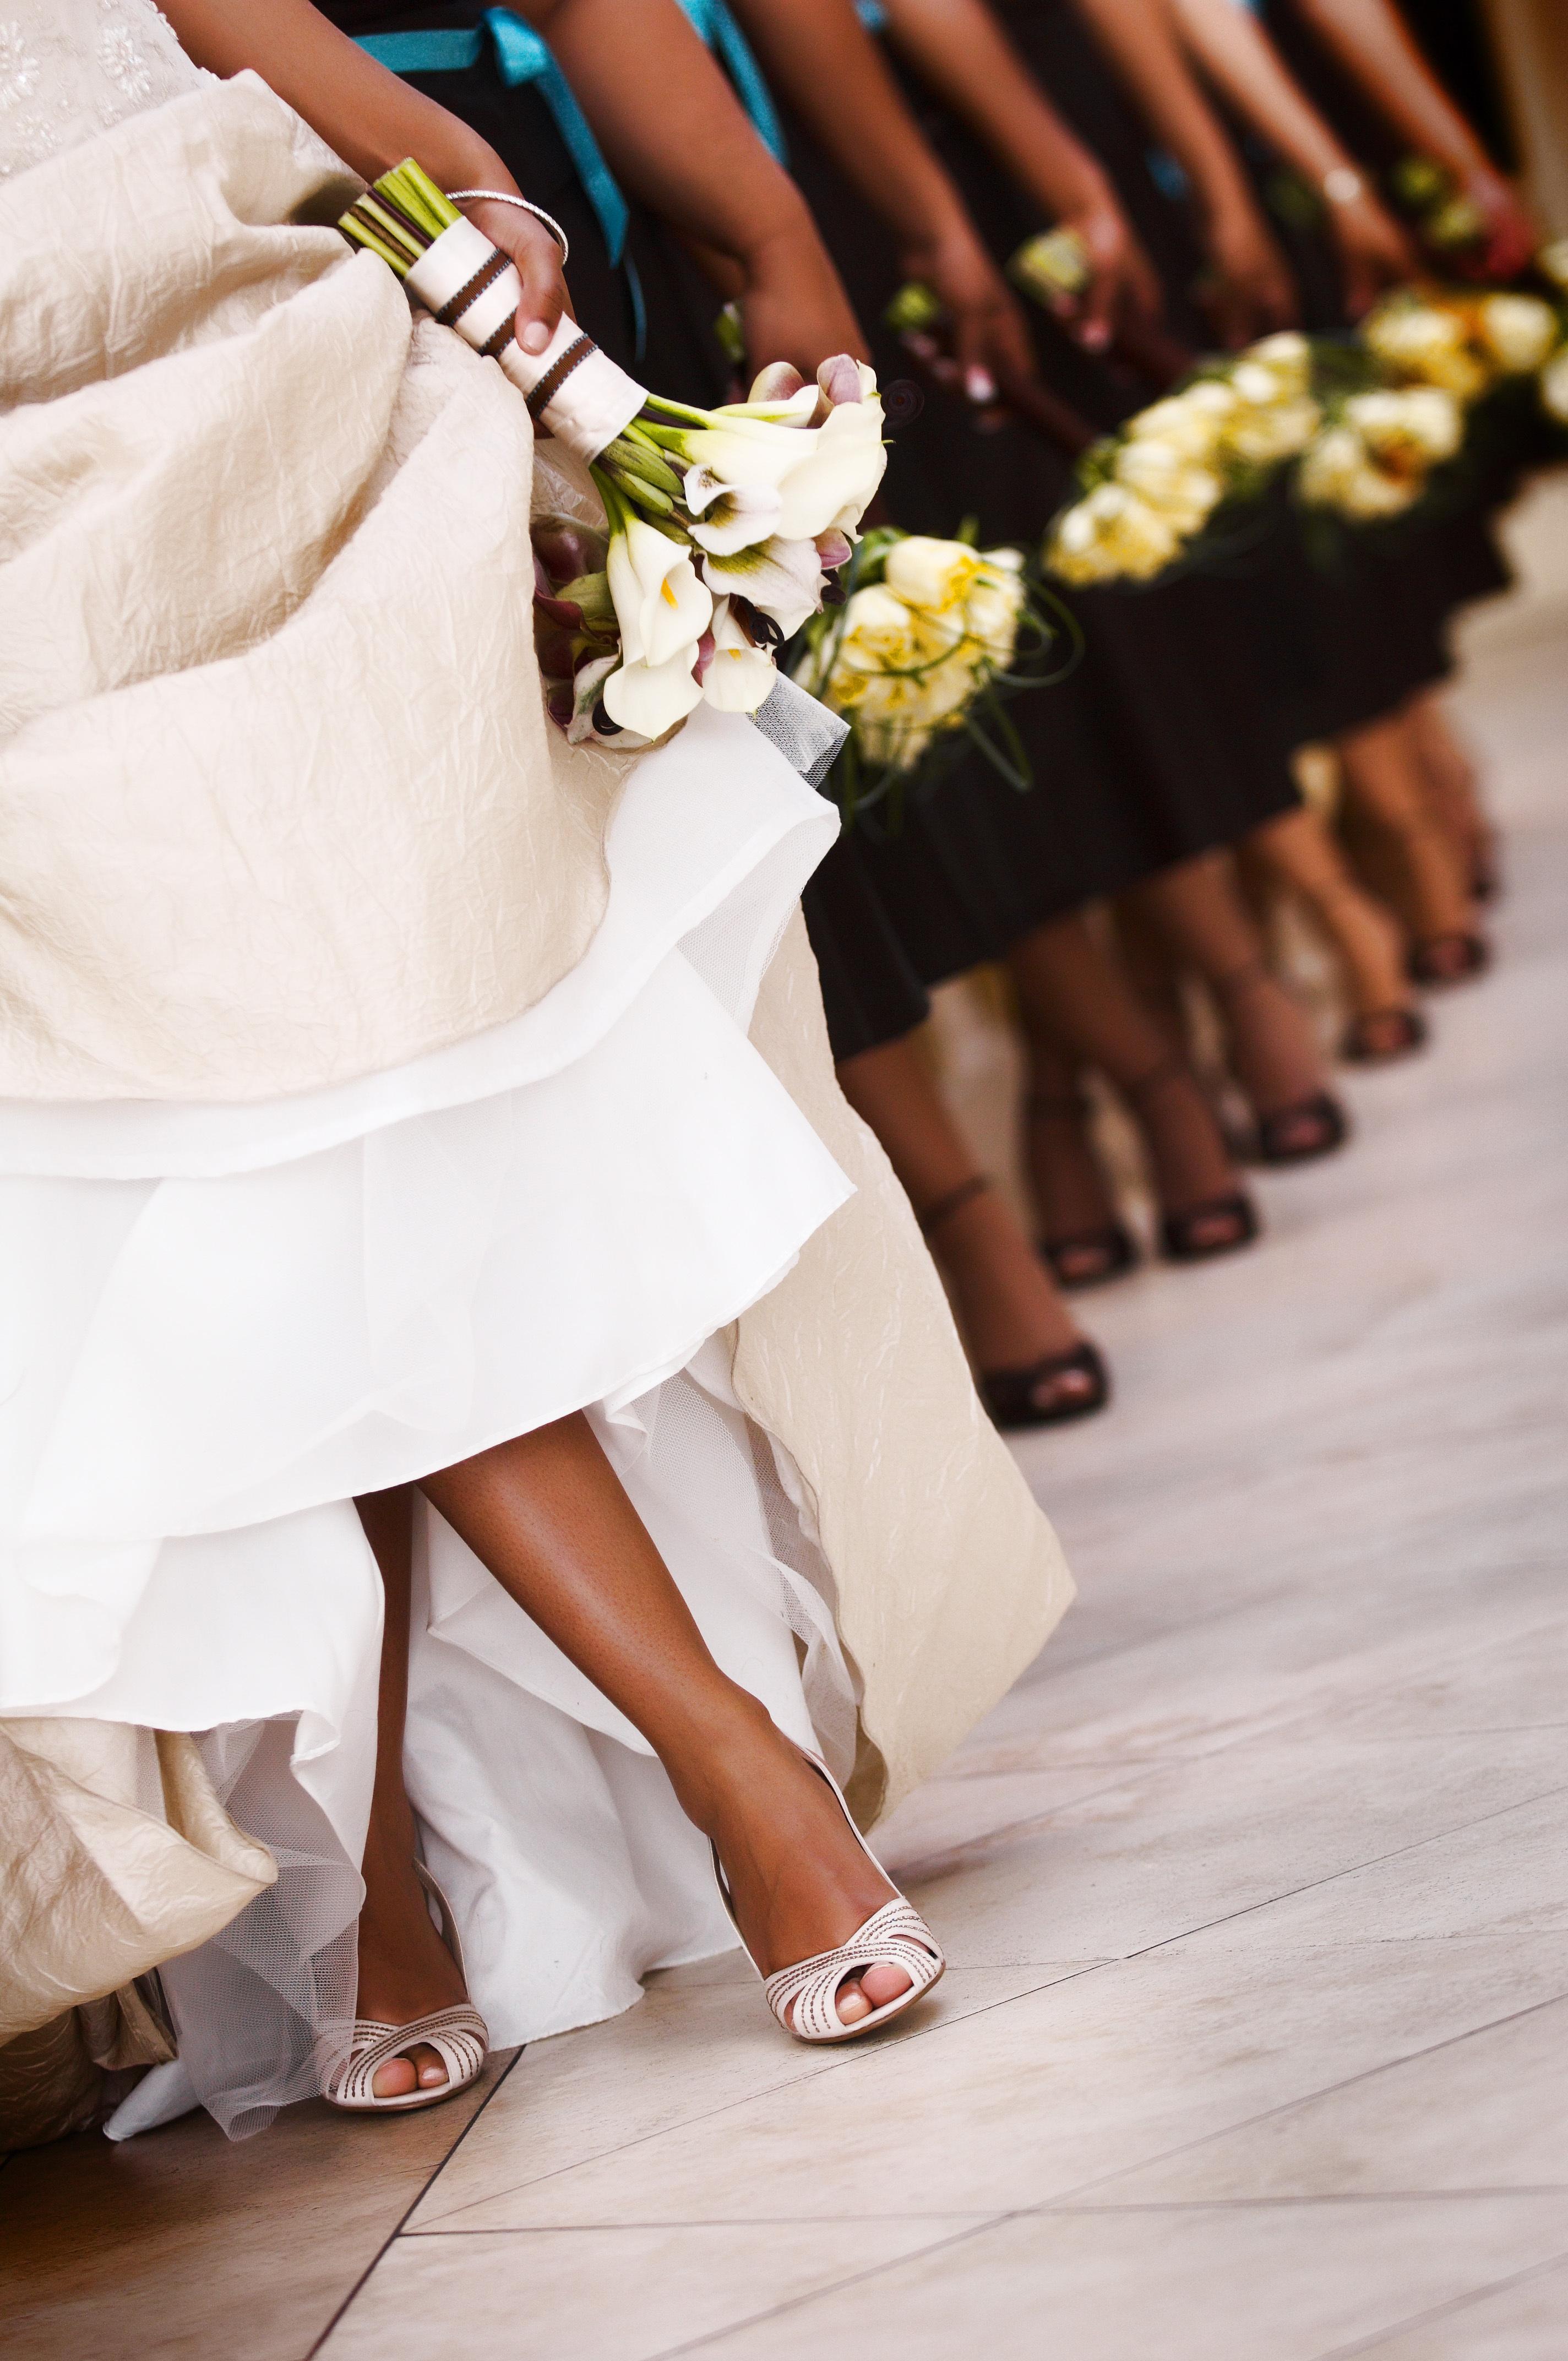 Flowers & Decor, Bridesmaids, Bridesmaids Dresses, Fashion, yellow, Bridesmaid Bouquets, Flowers, Wedding, Celebrations event planning design, Flower Wedding Dresses